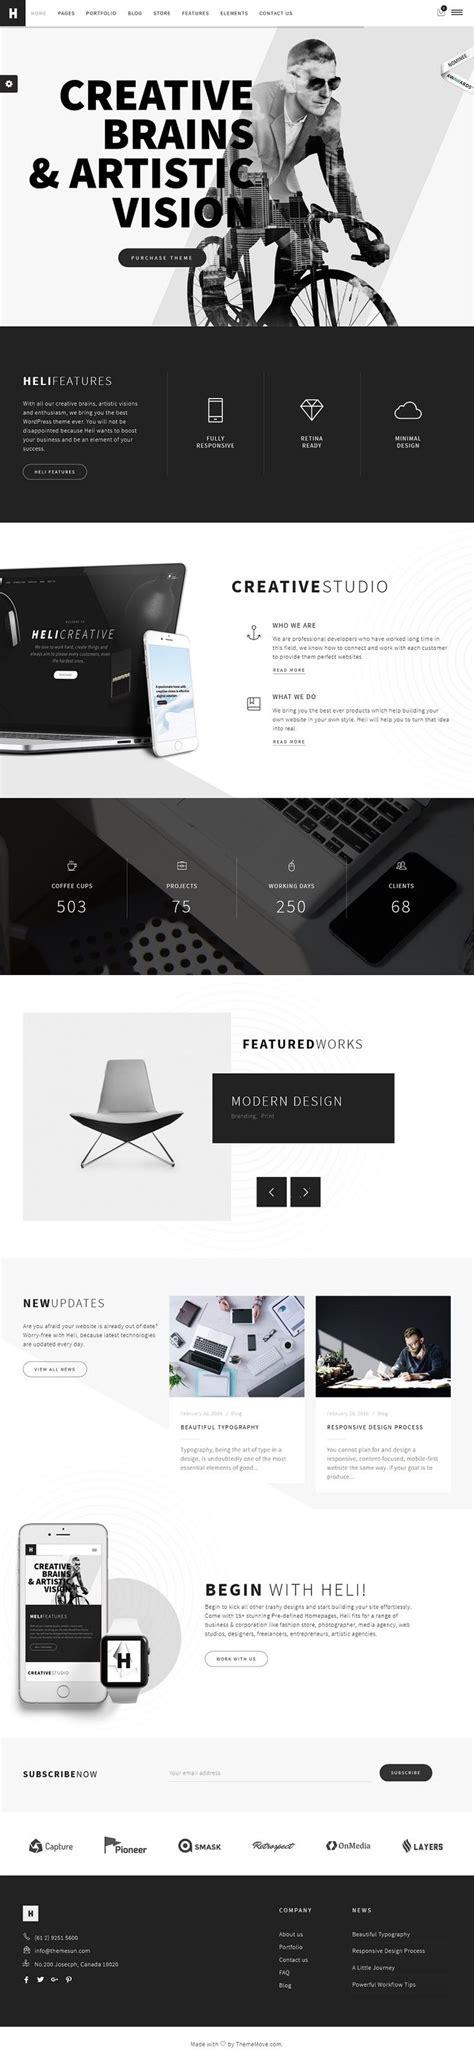 design inspiration web 2016 web design layouts에 관한 상위 25개 이상의 pinterest 아이디어 웹사이트 레이